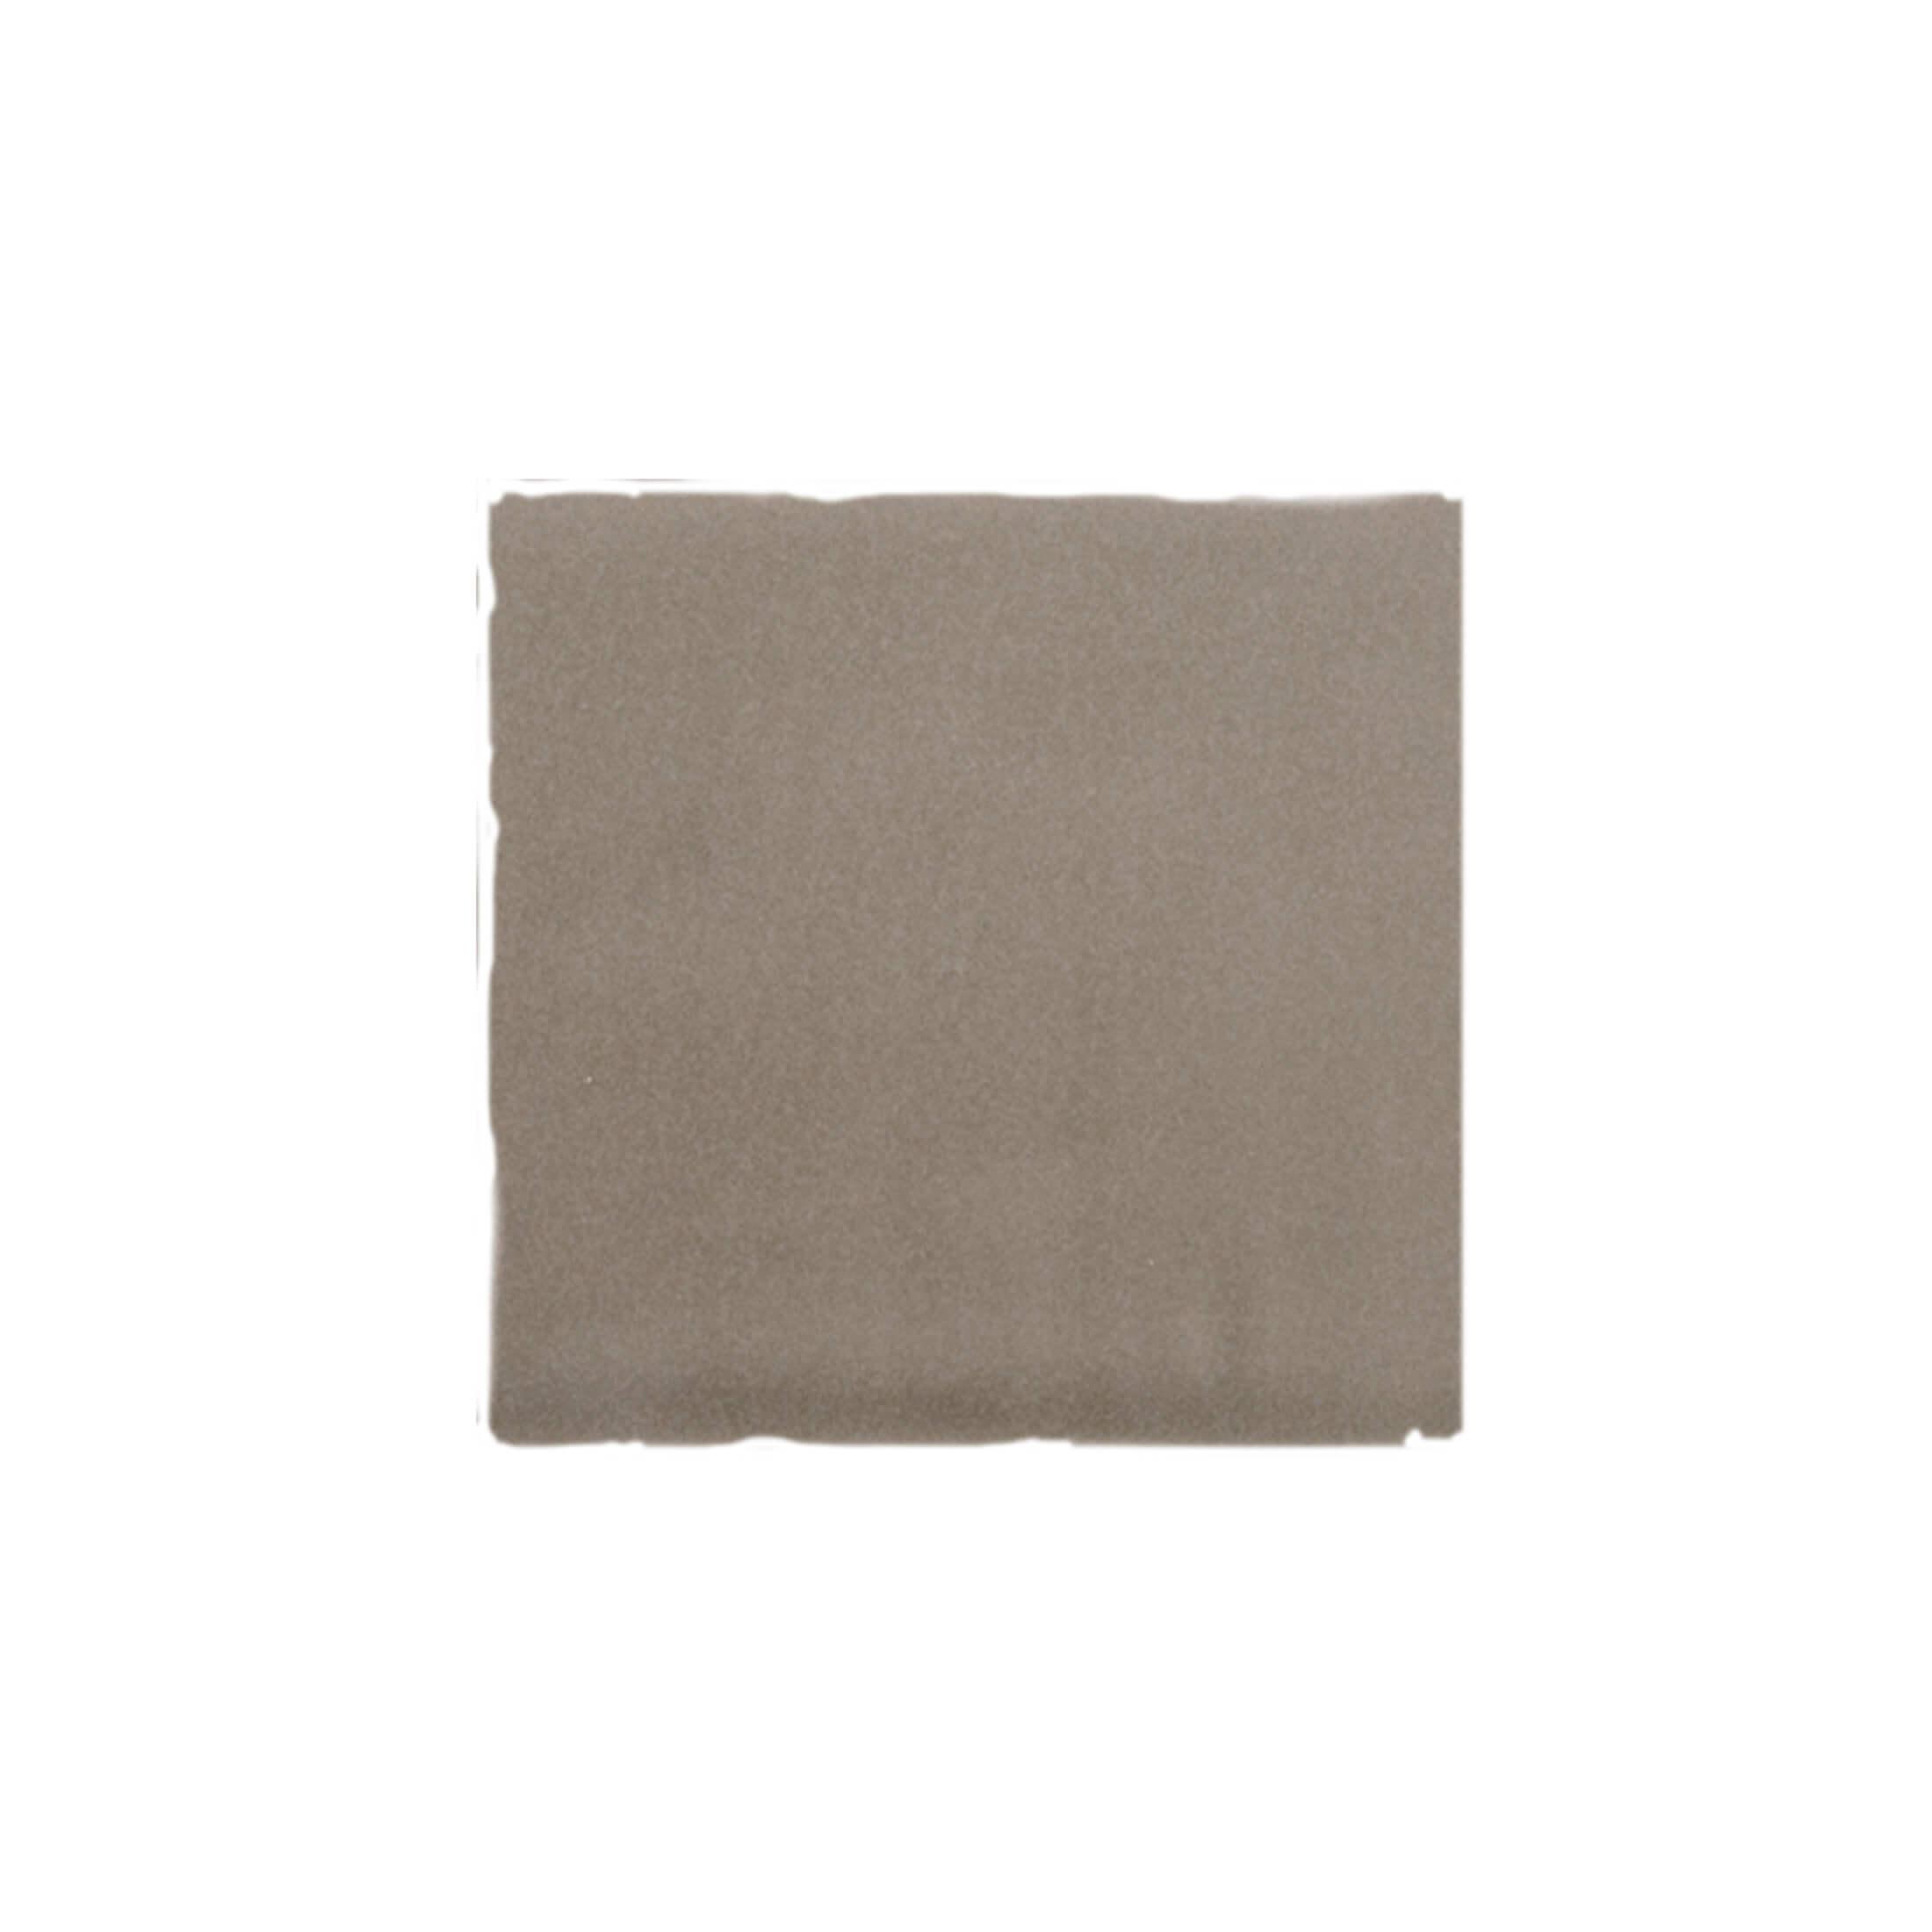 ADNT1002 - LISO  - 15 cm X 15 cm